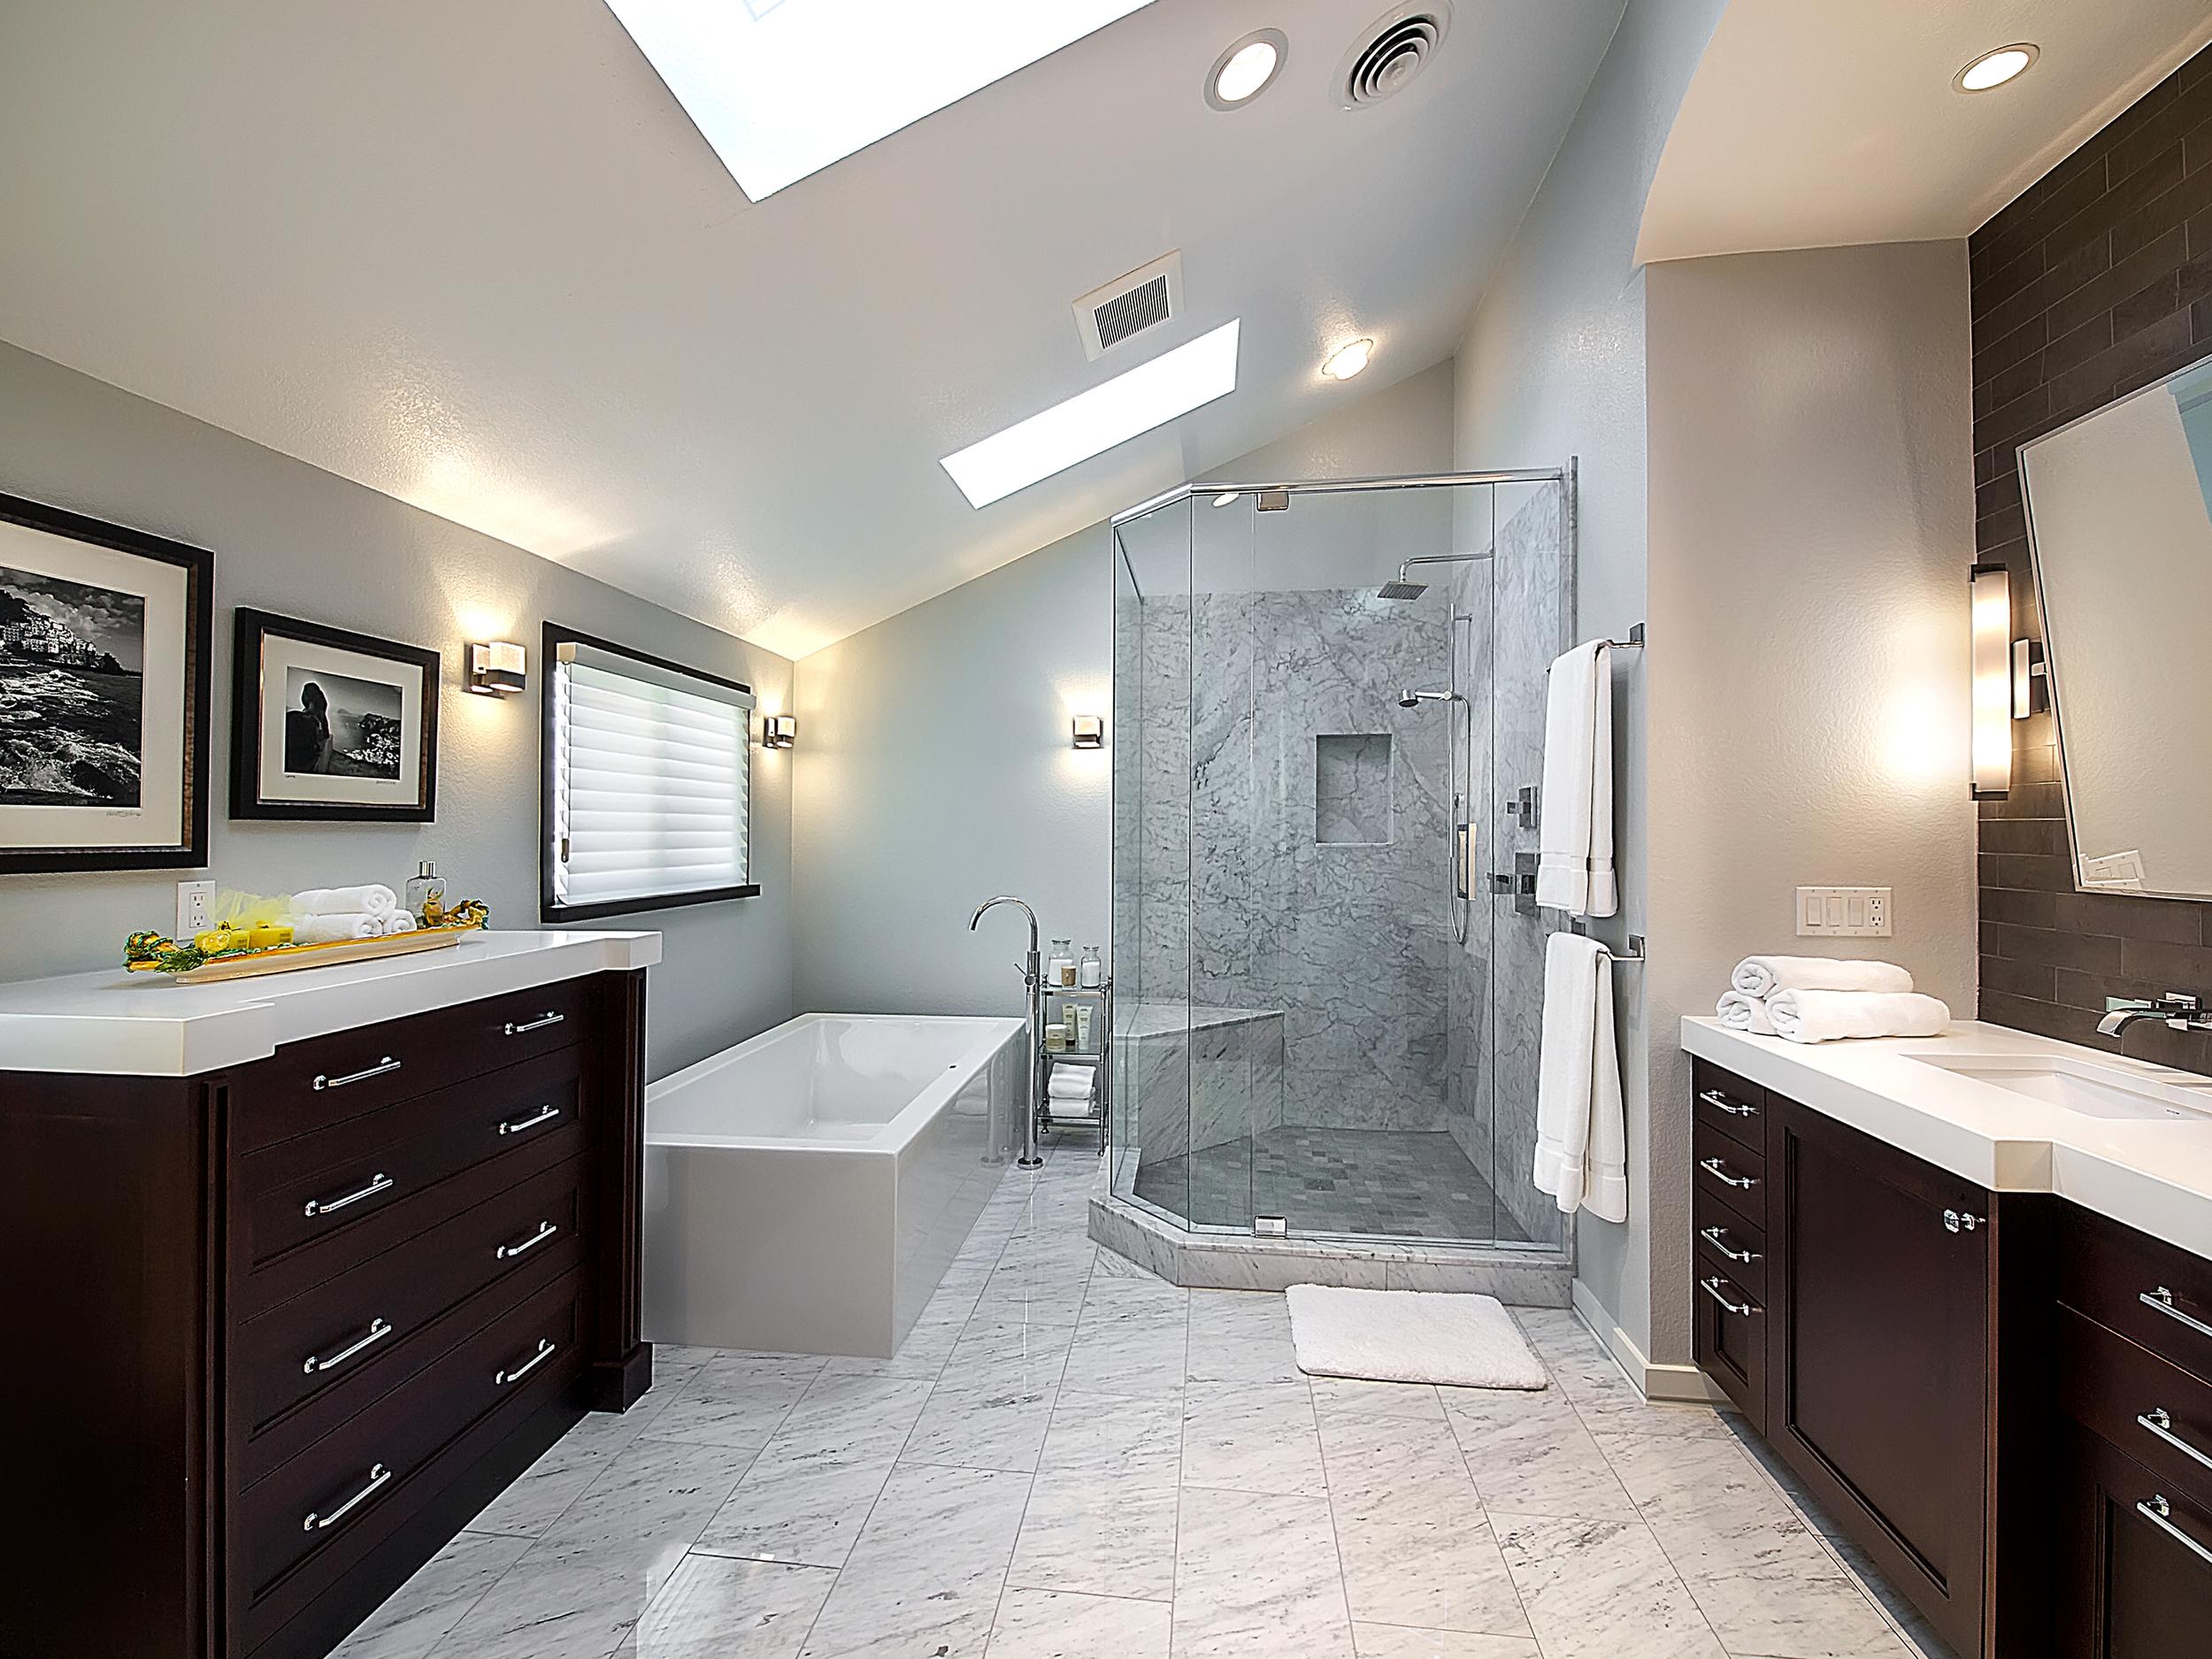 Transitional contrast Bathroom design idea for you ELC